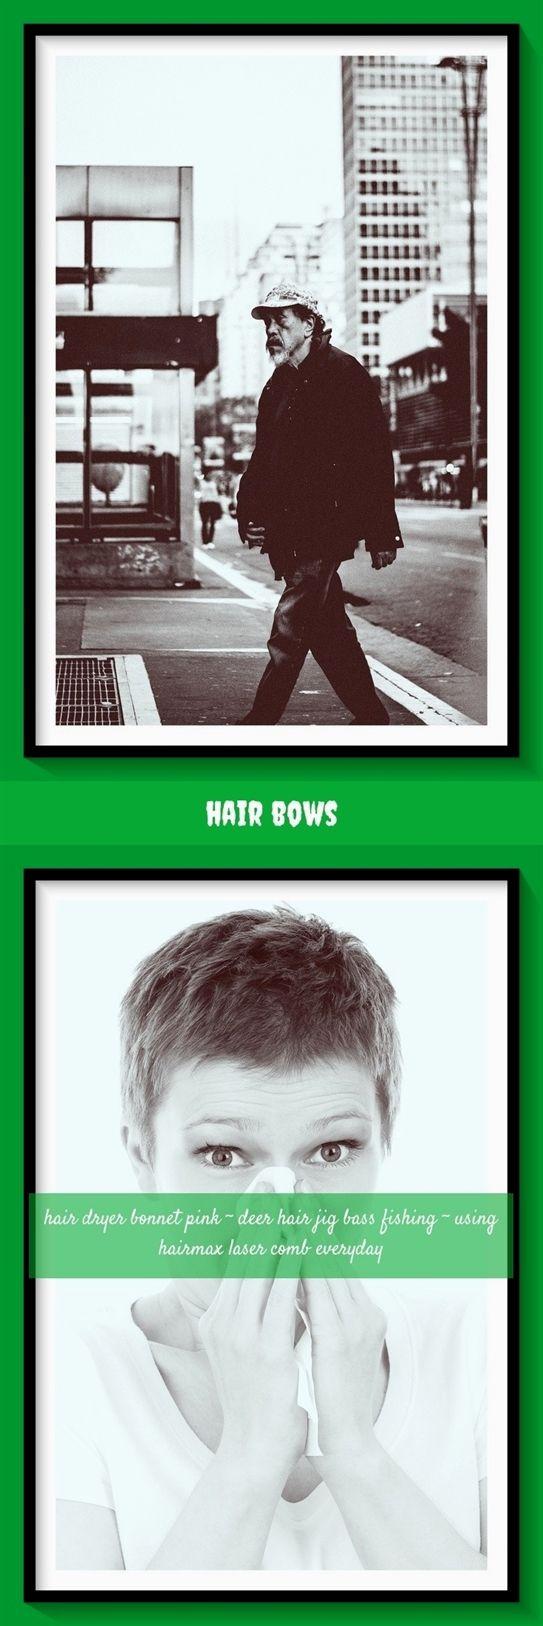 Hair bows cinderella hair extensions reviews